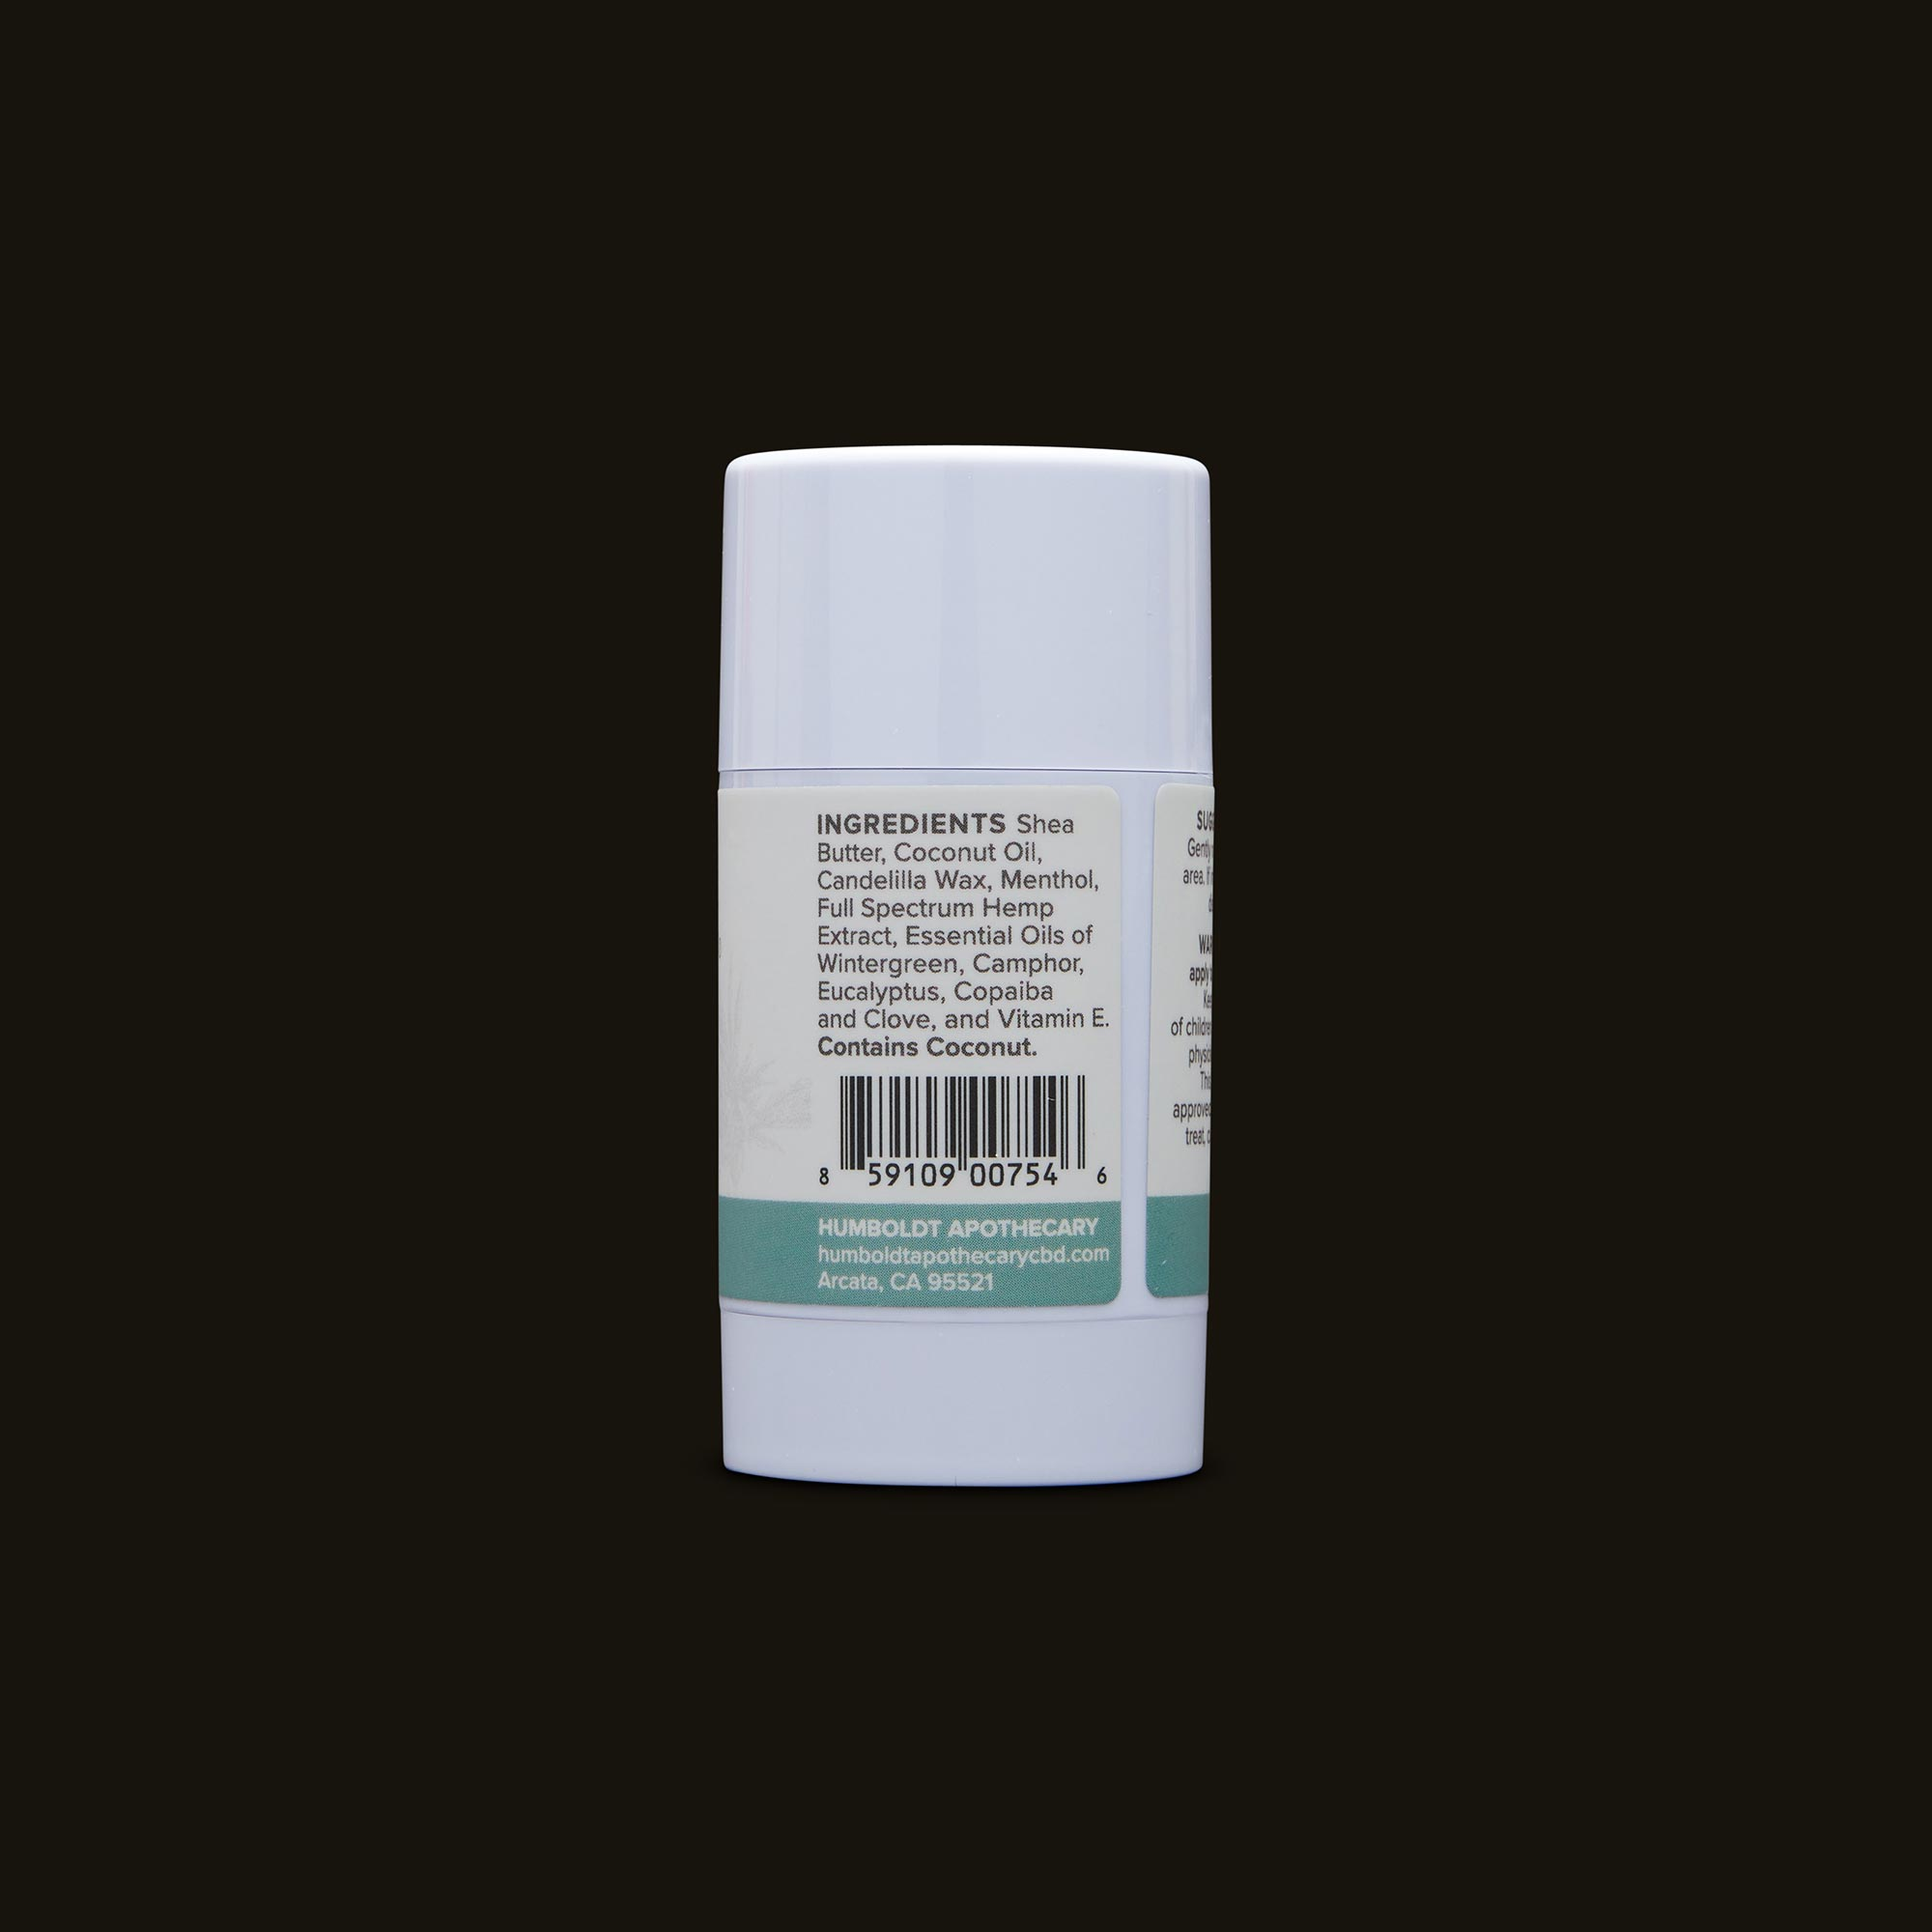 Humboldt Apothecary Wintergreen CBD Stick Ingredients